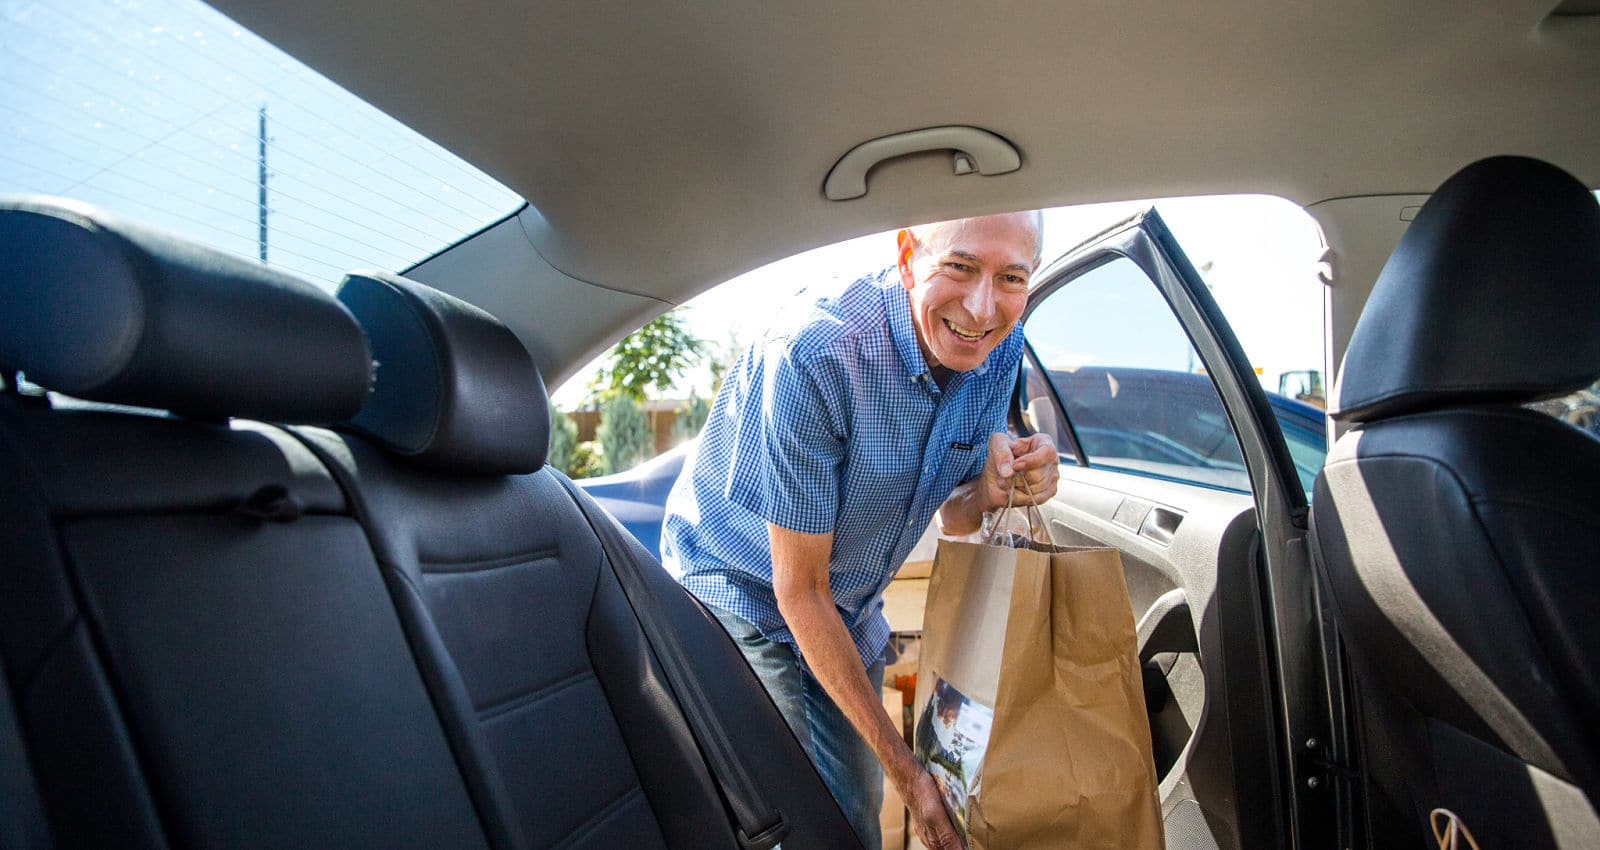 Volunteer loading meal bag into car